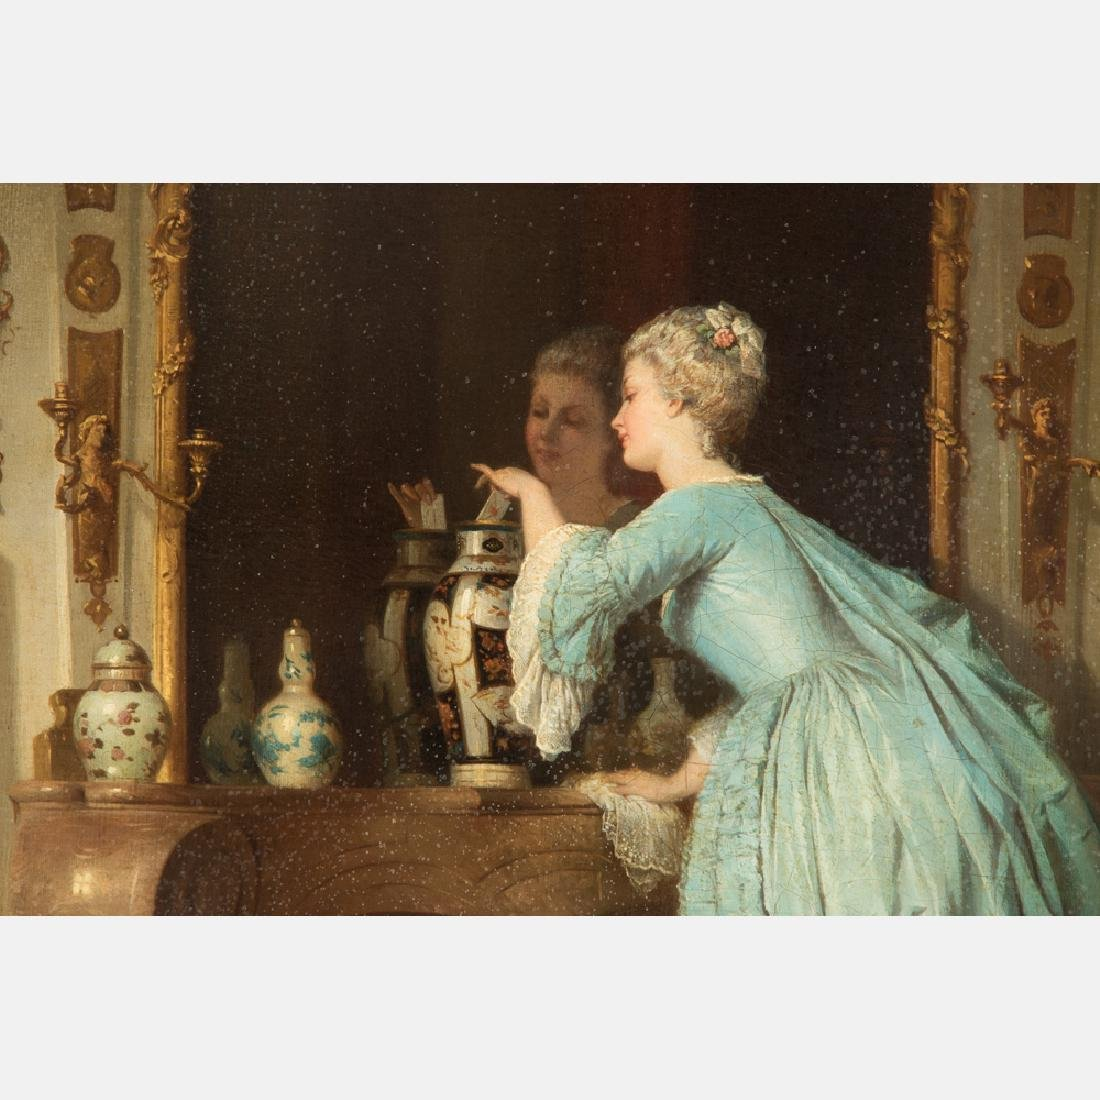 Alfred Emile Leopold Stevens (1823-1906) The Love Note, - 11